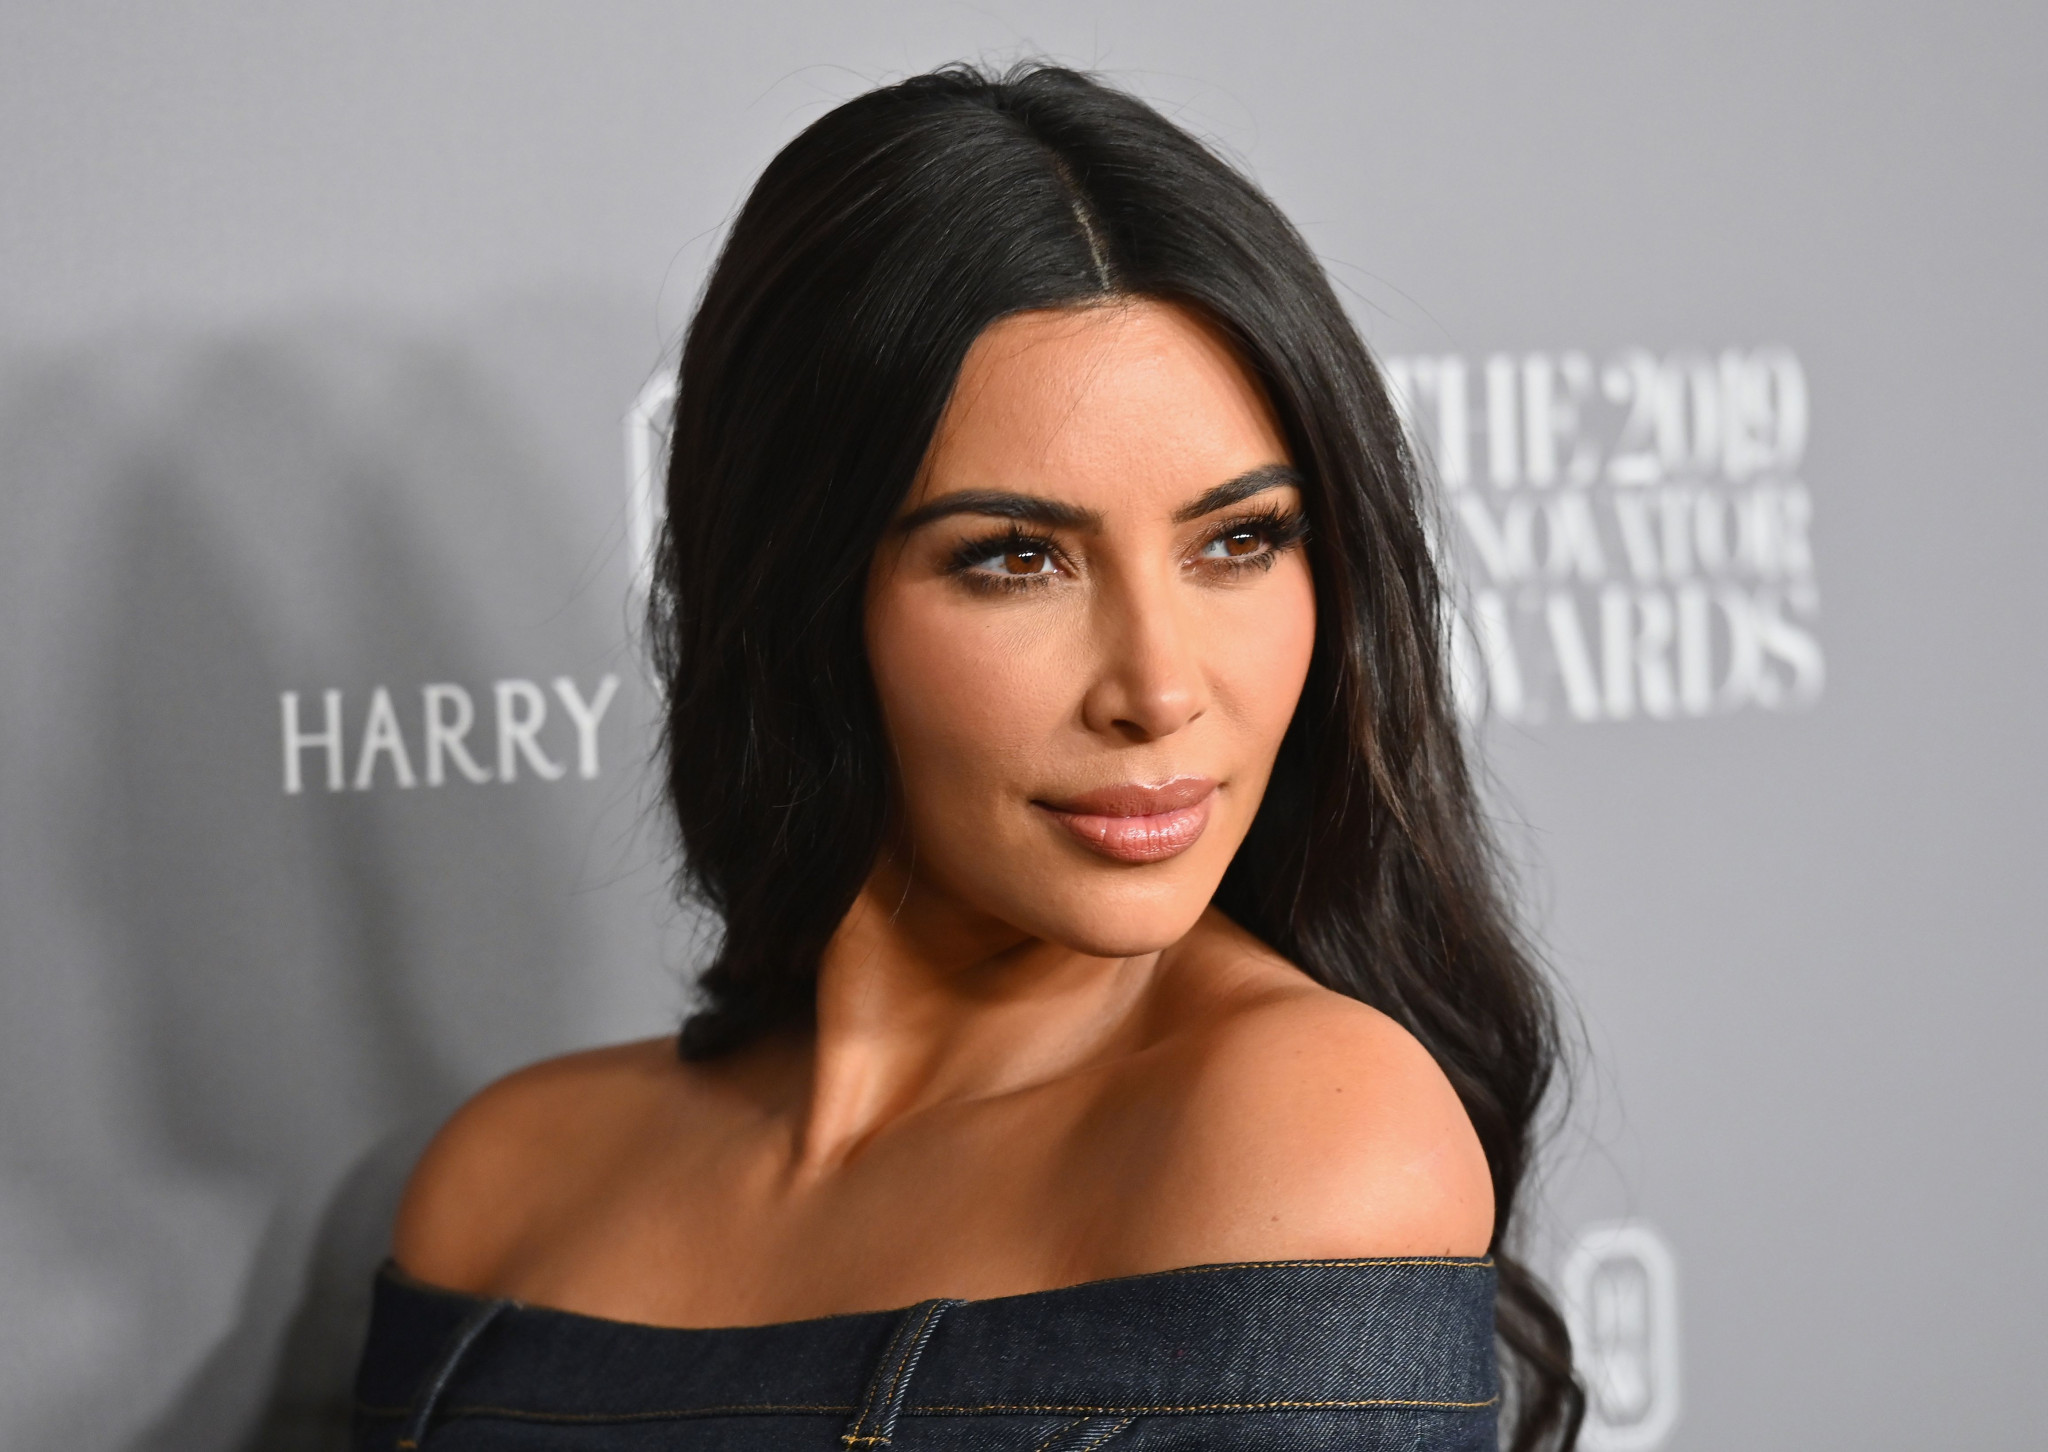 Kardashian West company Skims named USOPC loungewear designer for Tokyo 2020